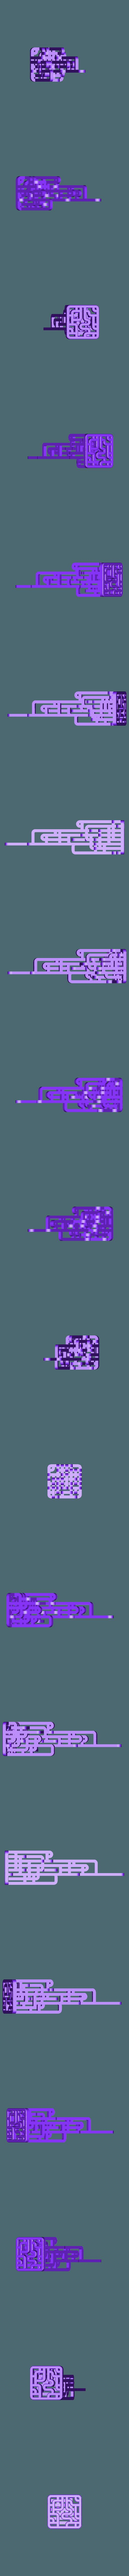 big2.stl Download free STL file Procedural Loops  • 3D print template, ferjerez3d